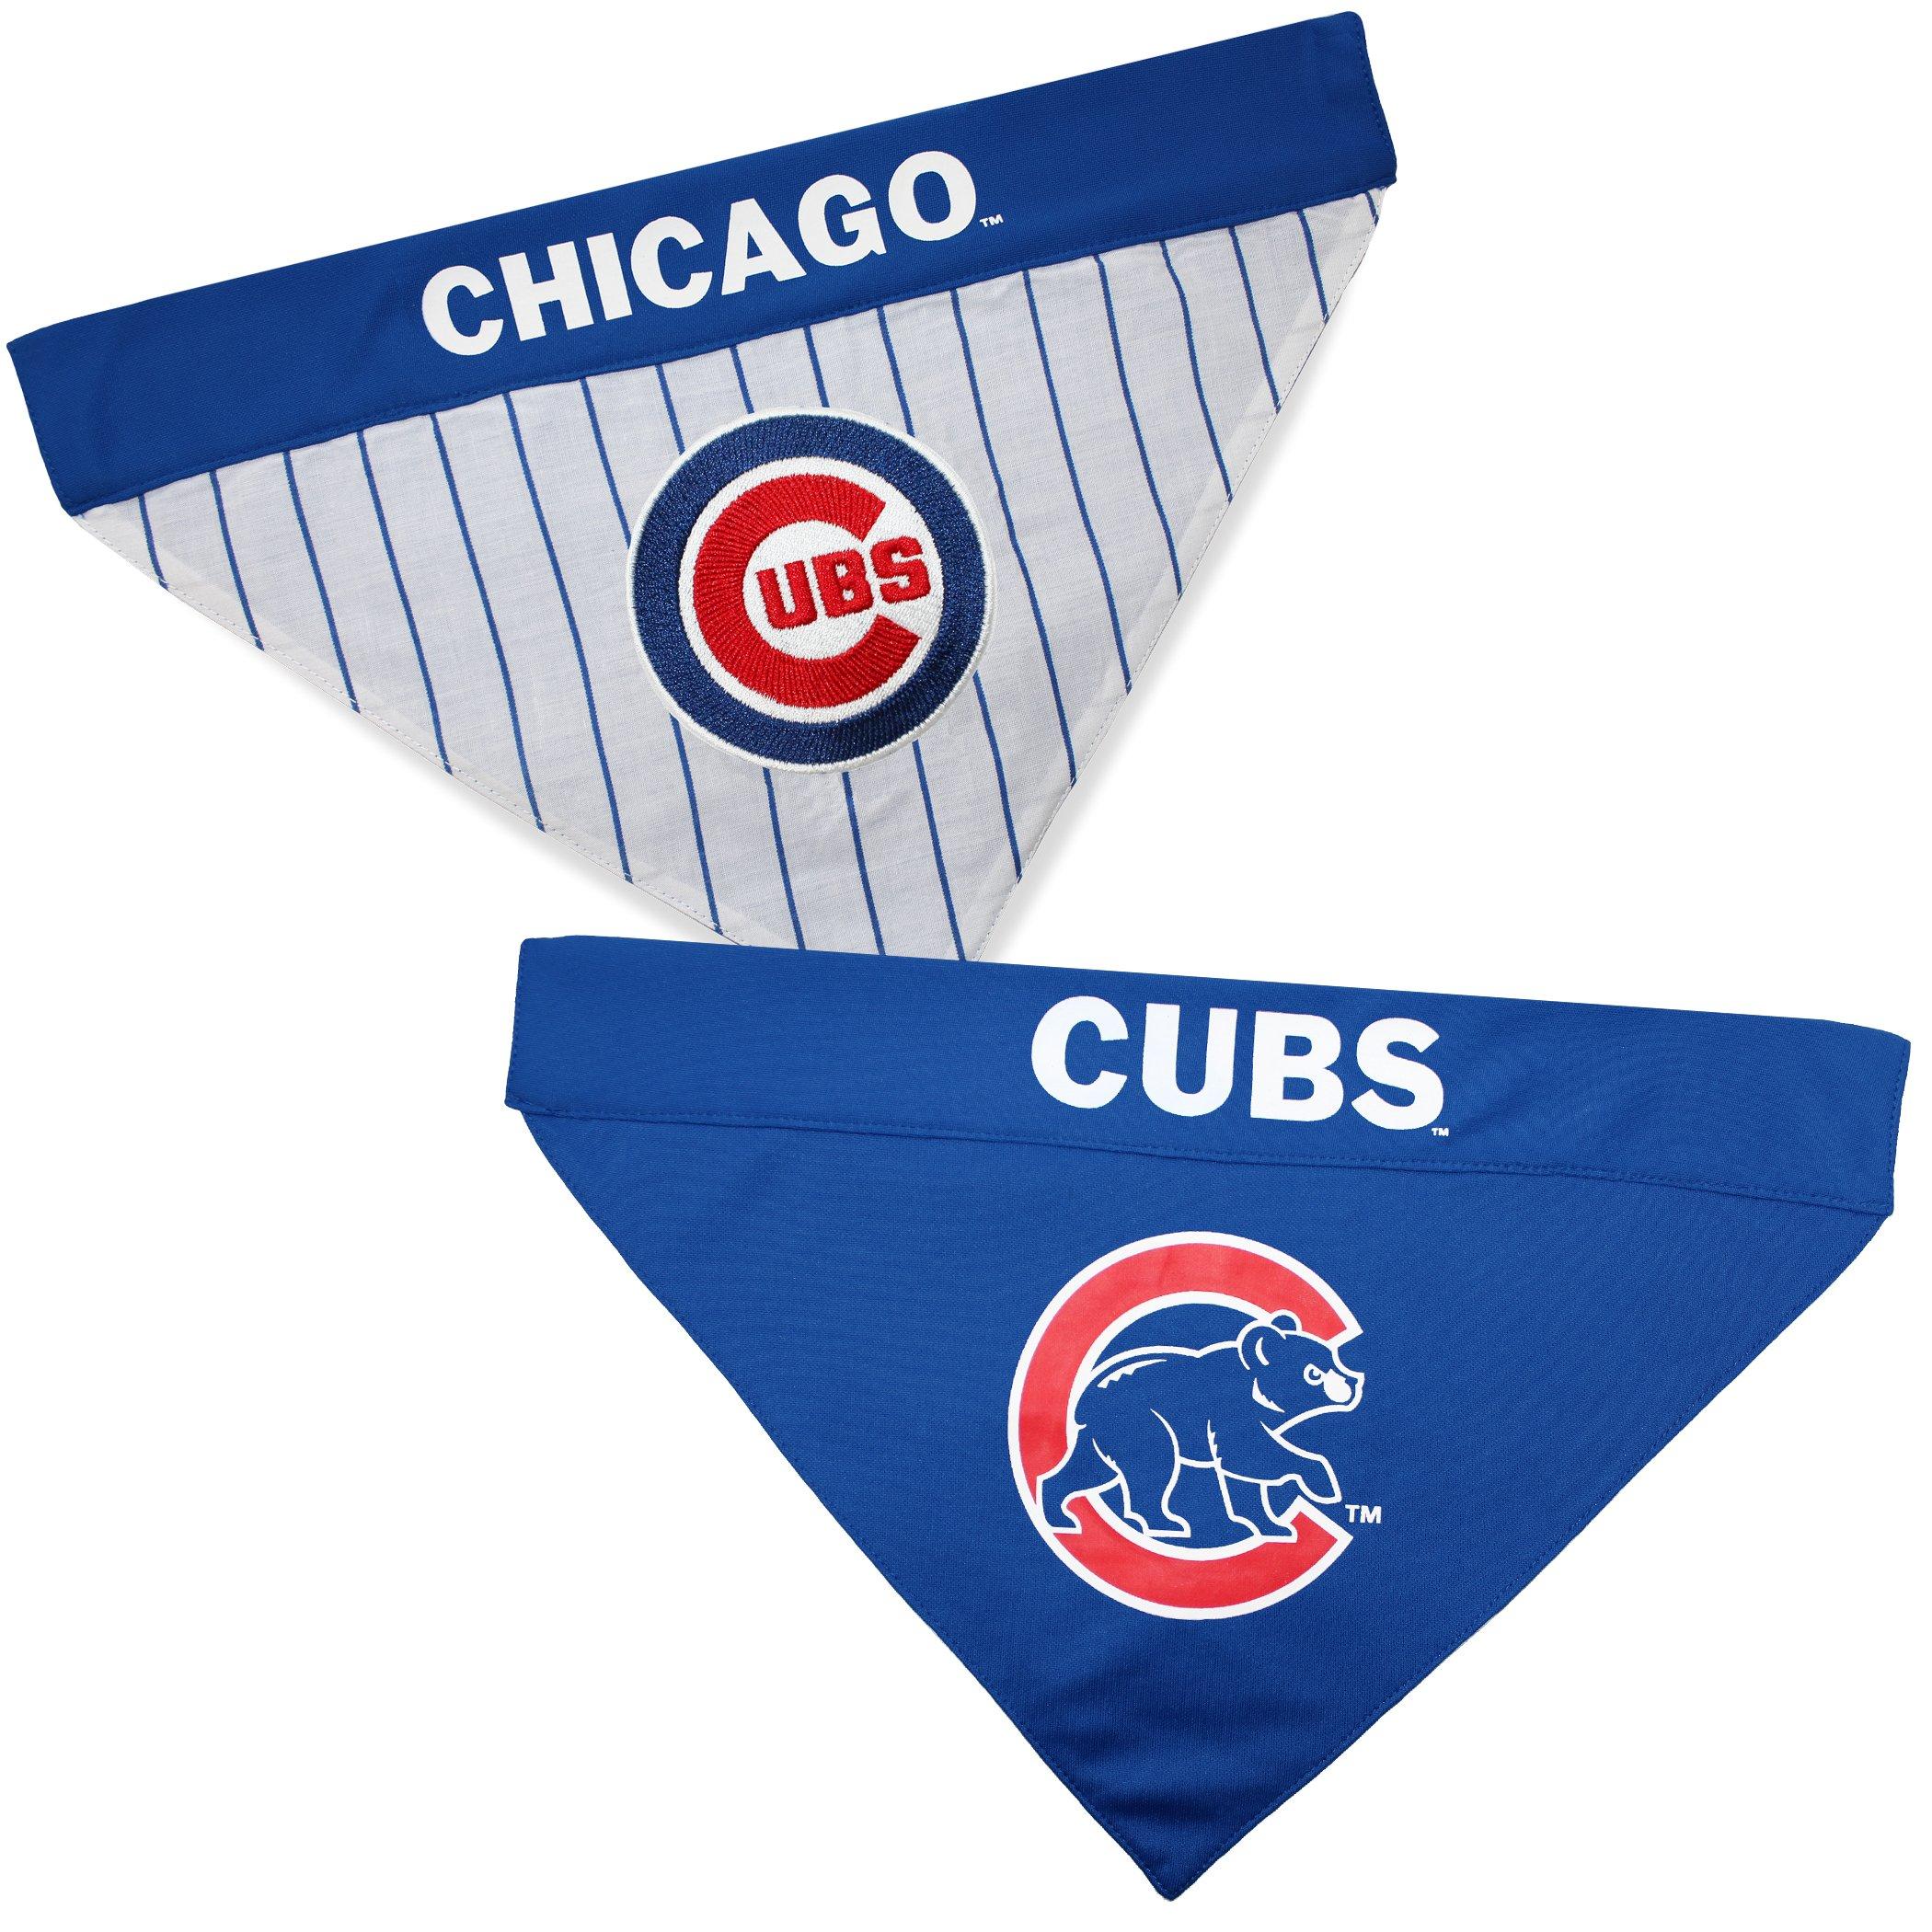 Pets First CUB-3217-S-M MLB Dog Bandana - Chicago Cubs Reversible Pet Bandana, Small/Medium, MLB Team Color